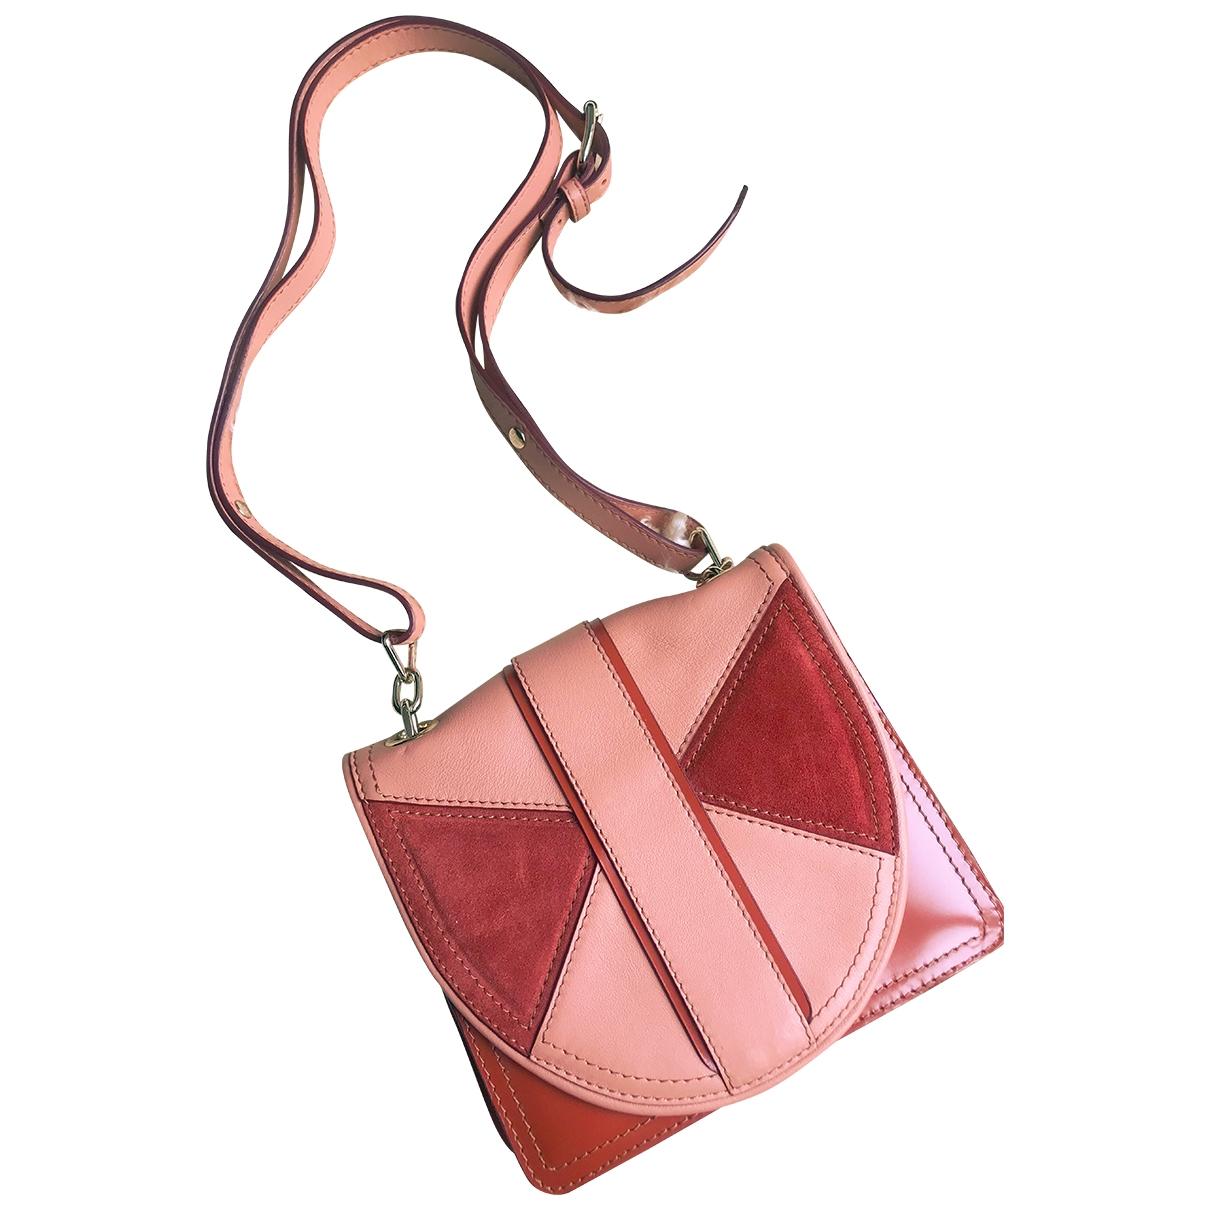 Max Mara Max Mara Atelier Brown Leather handbag for Women \N